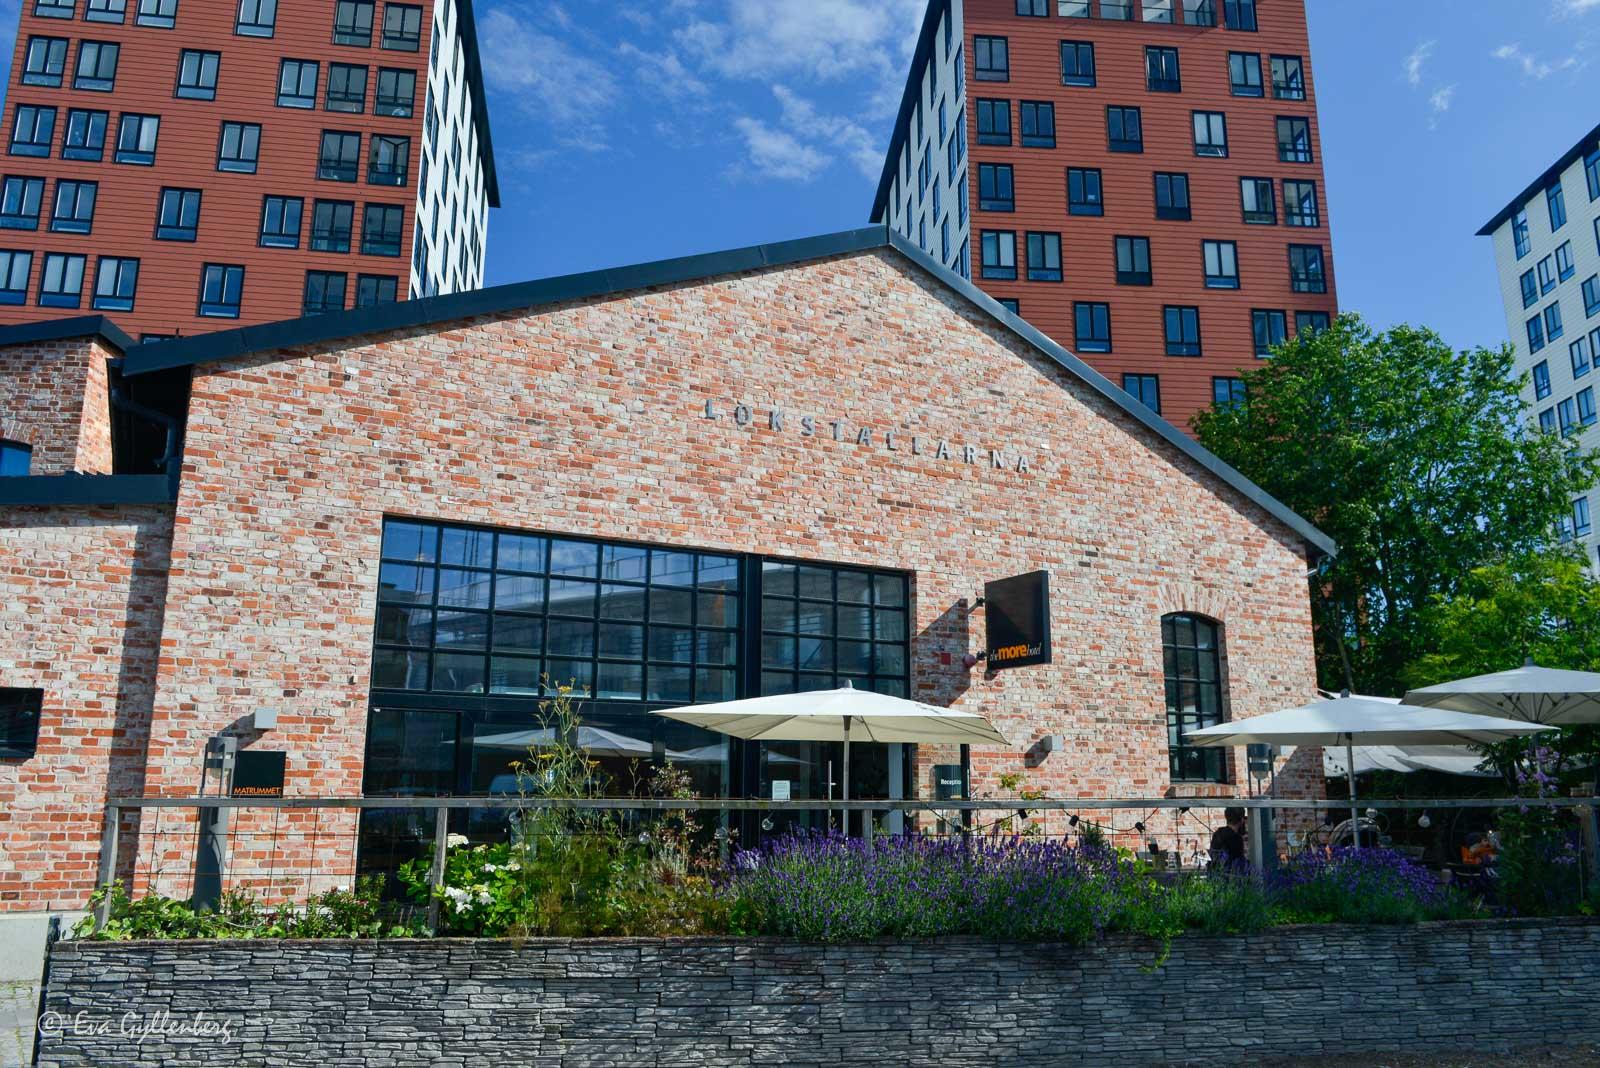 The More Hotel - Snyggt lägenhetshotell i Lund 8